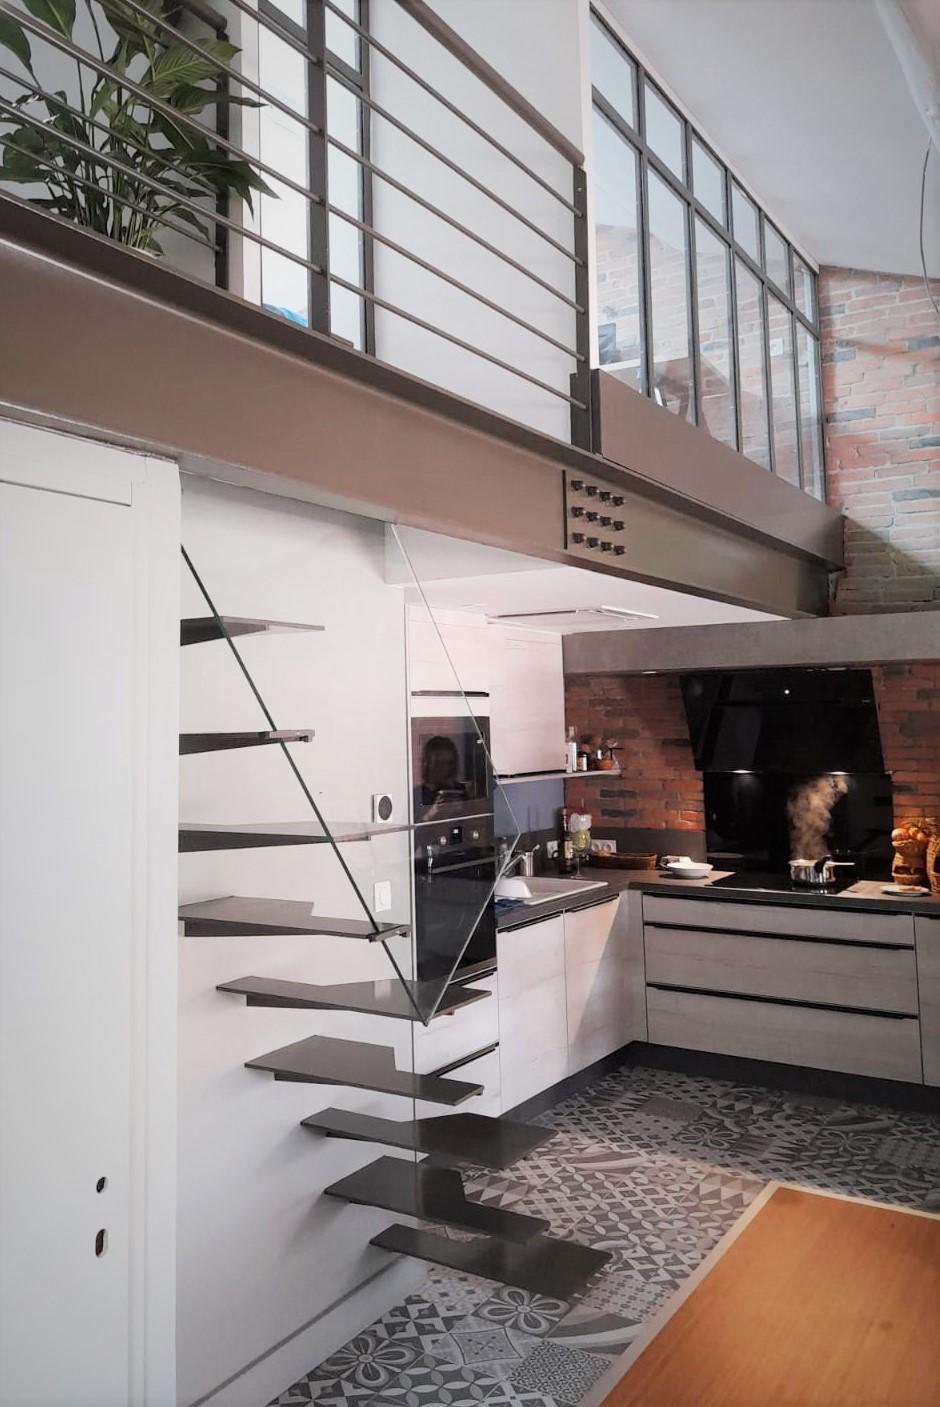 inoxngo ferronnier Marseille - escalier pas japonais 2